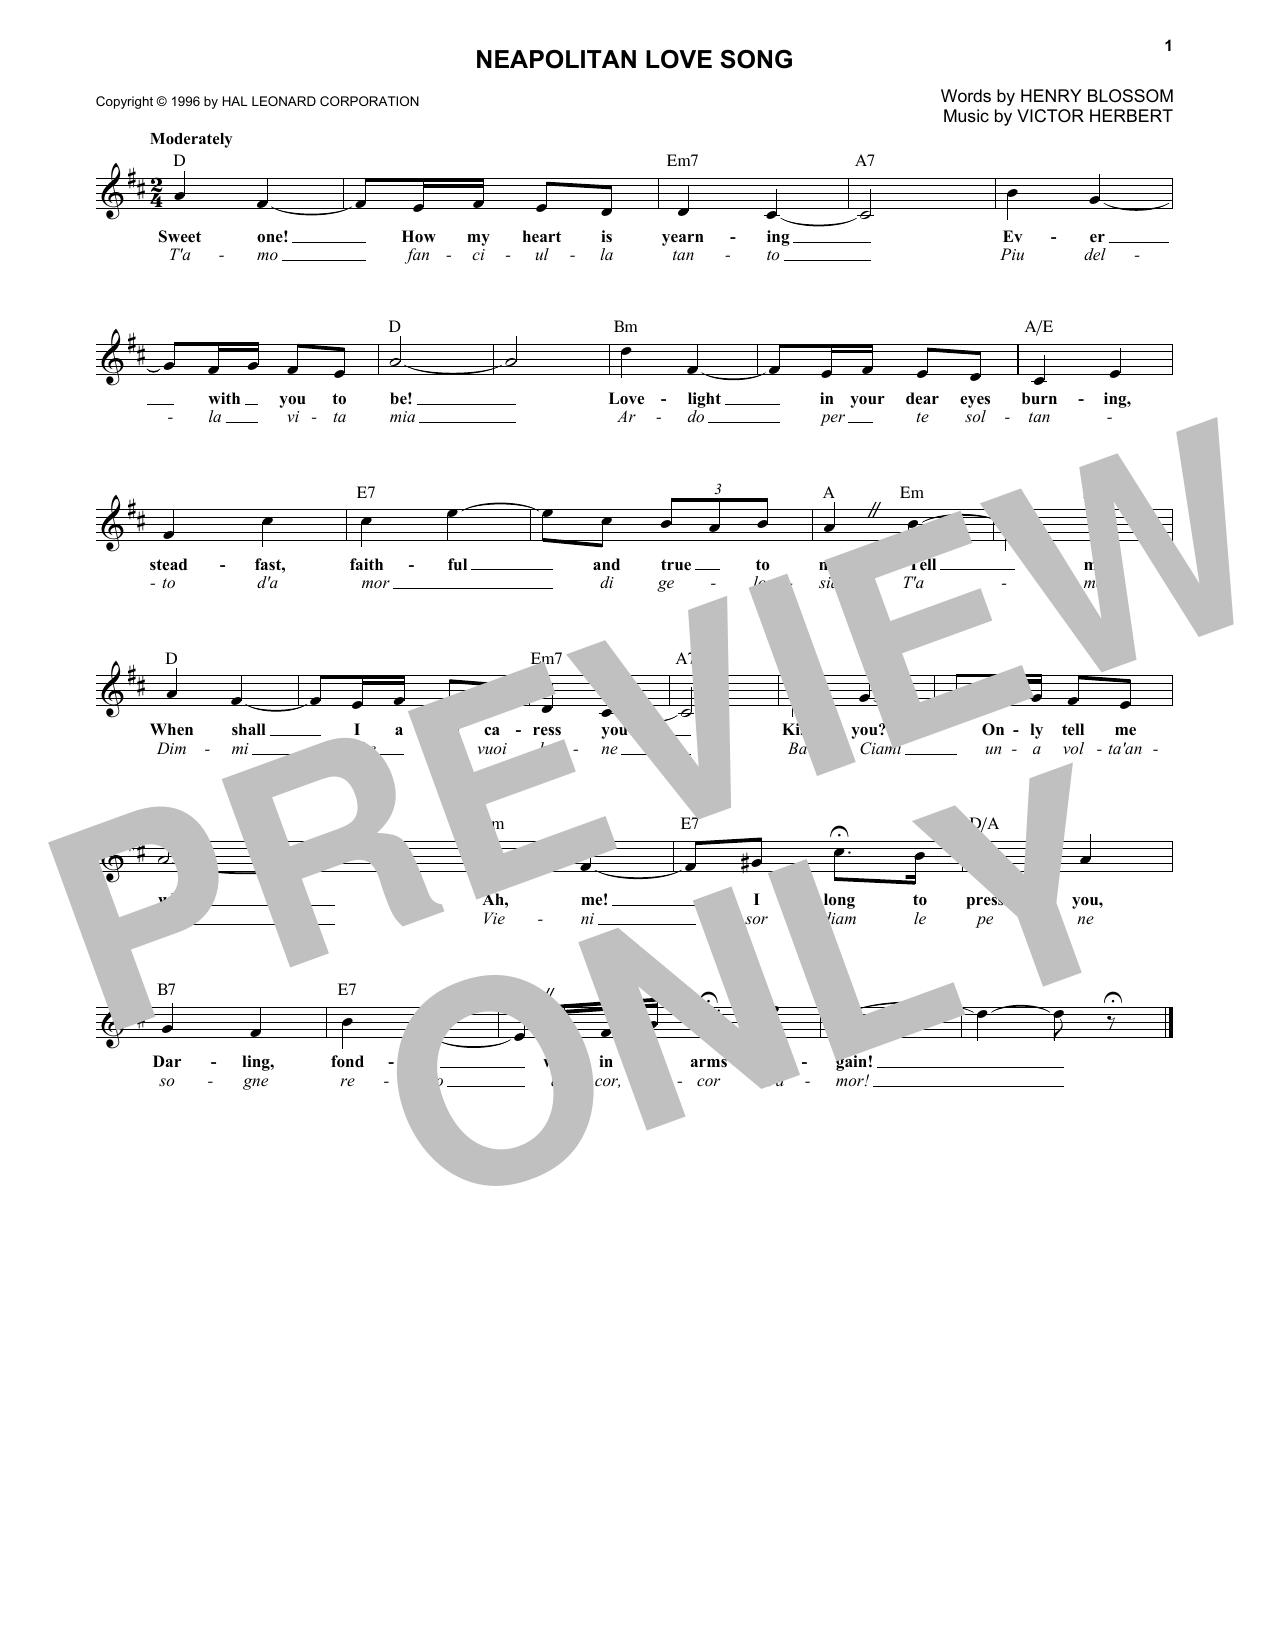 Neapolitan Love Song Sheet Music